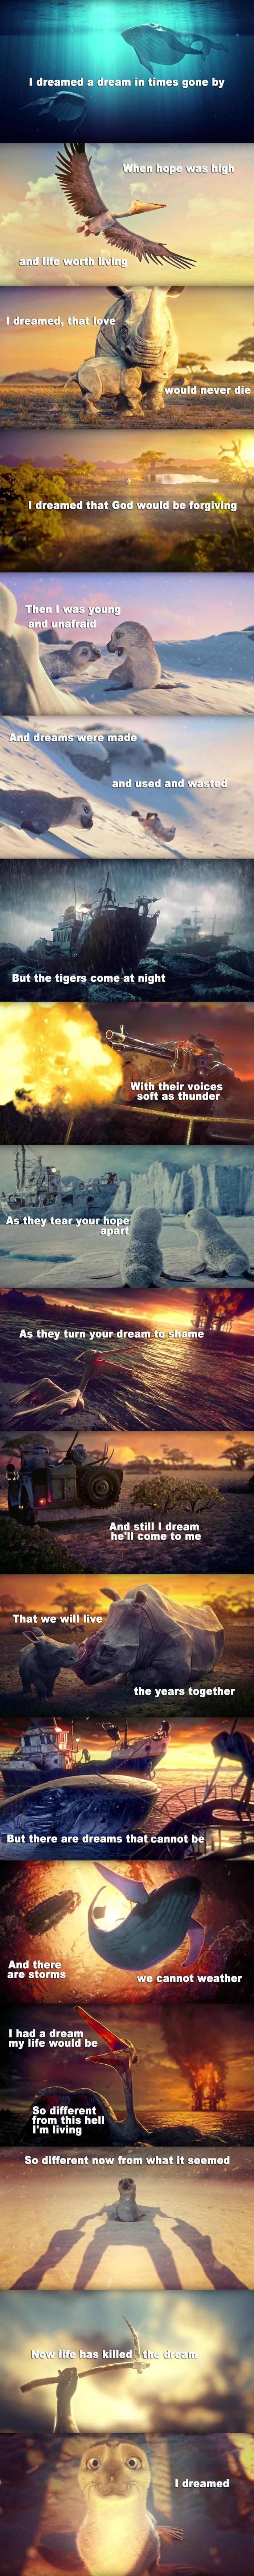 They also dream.